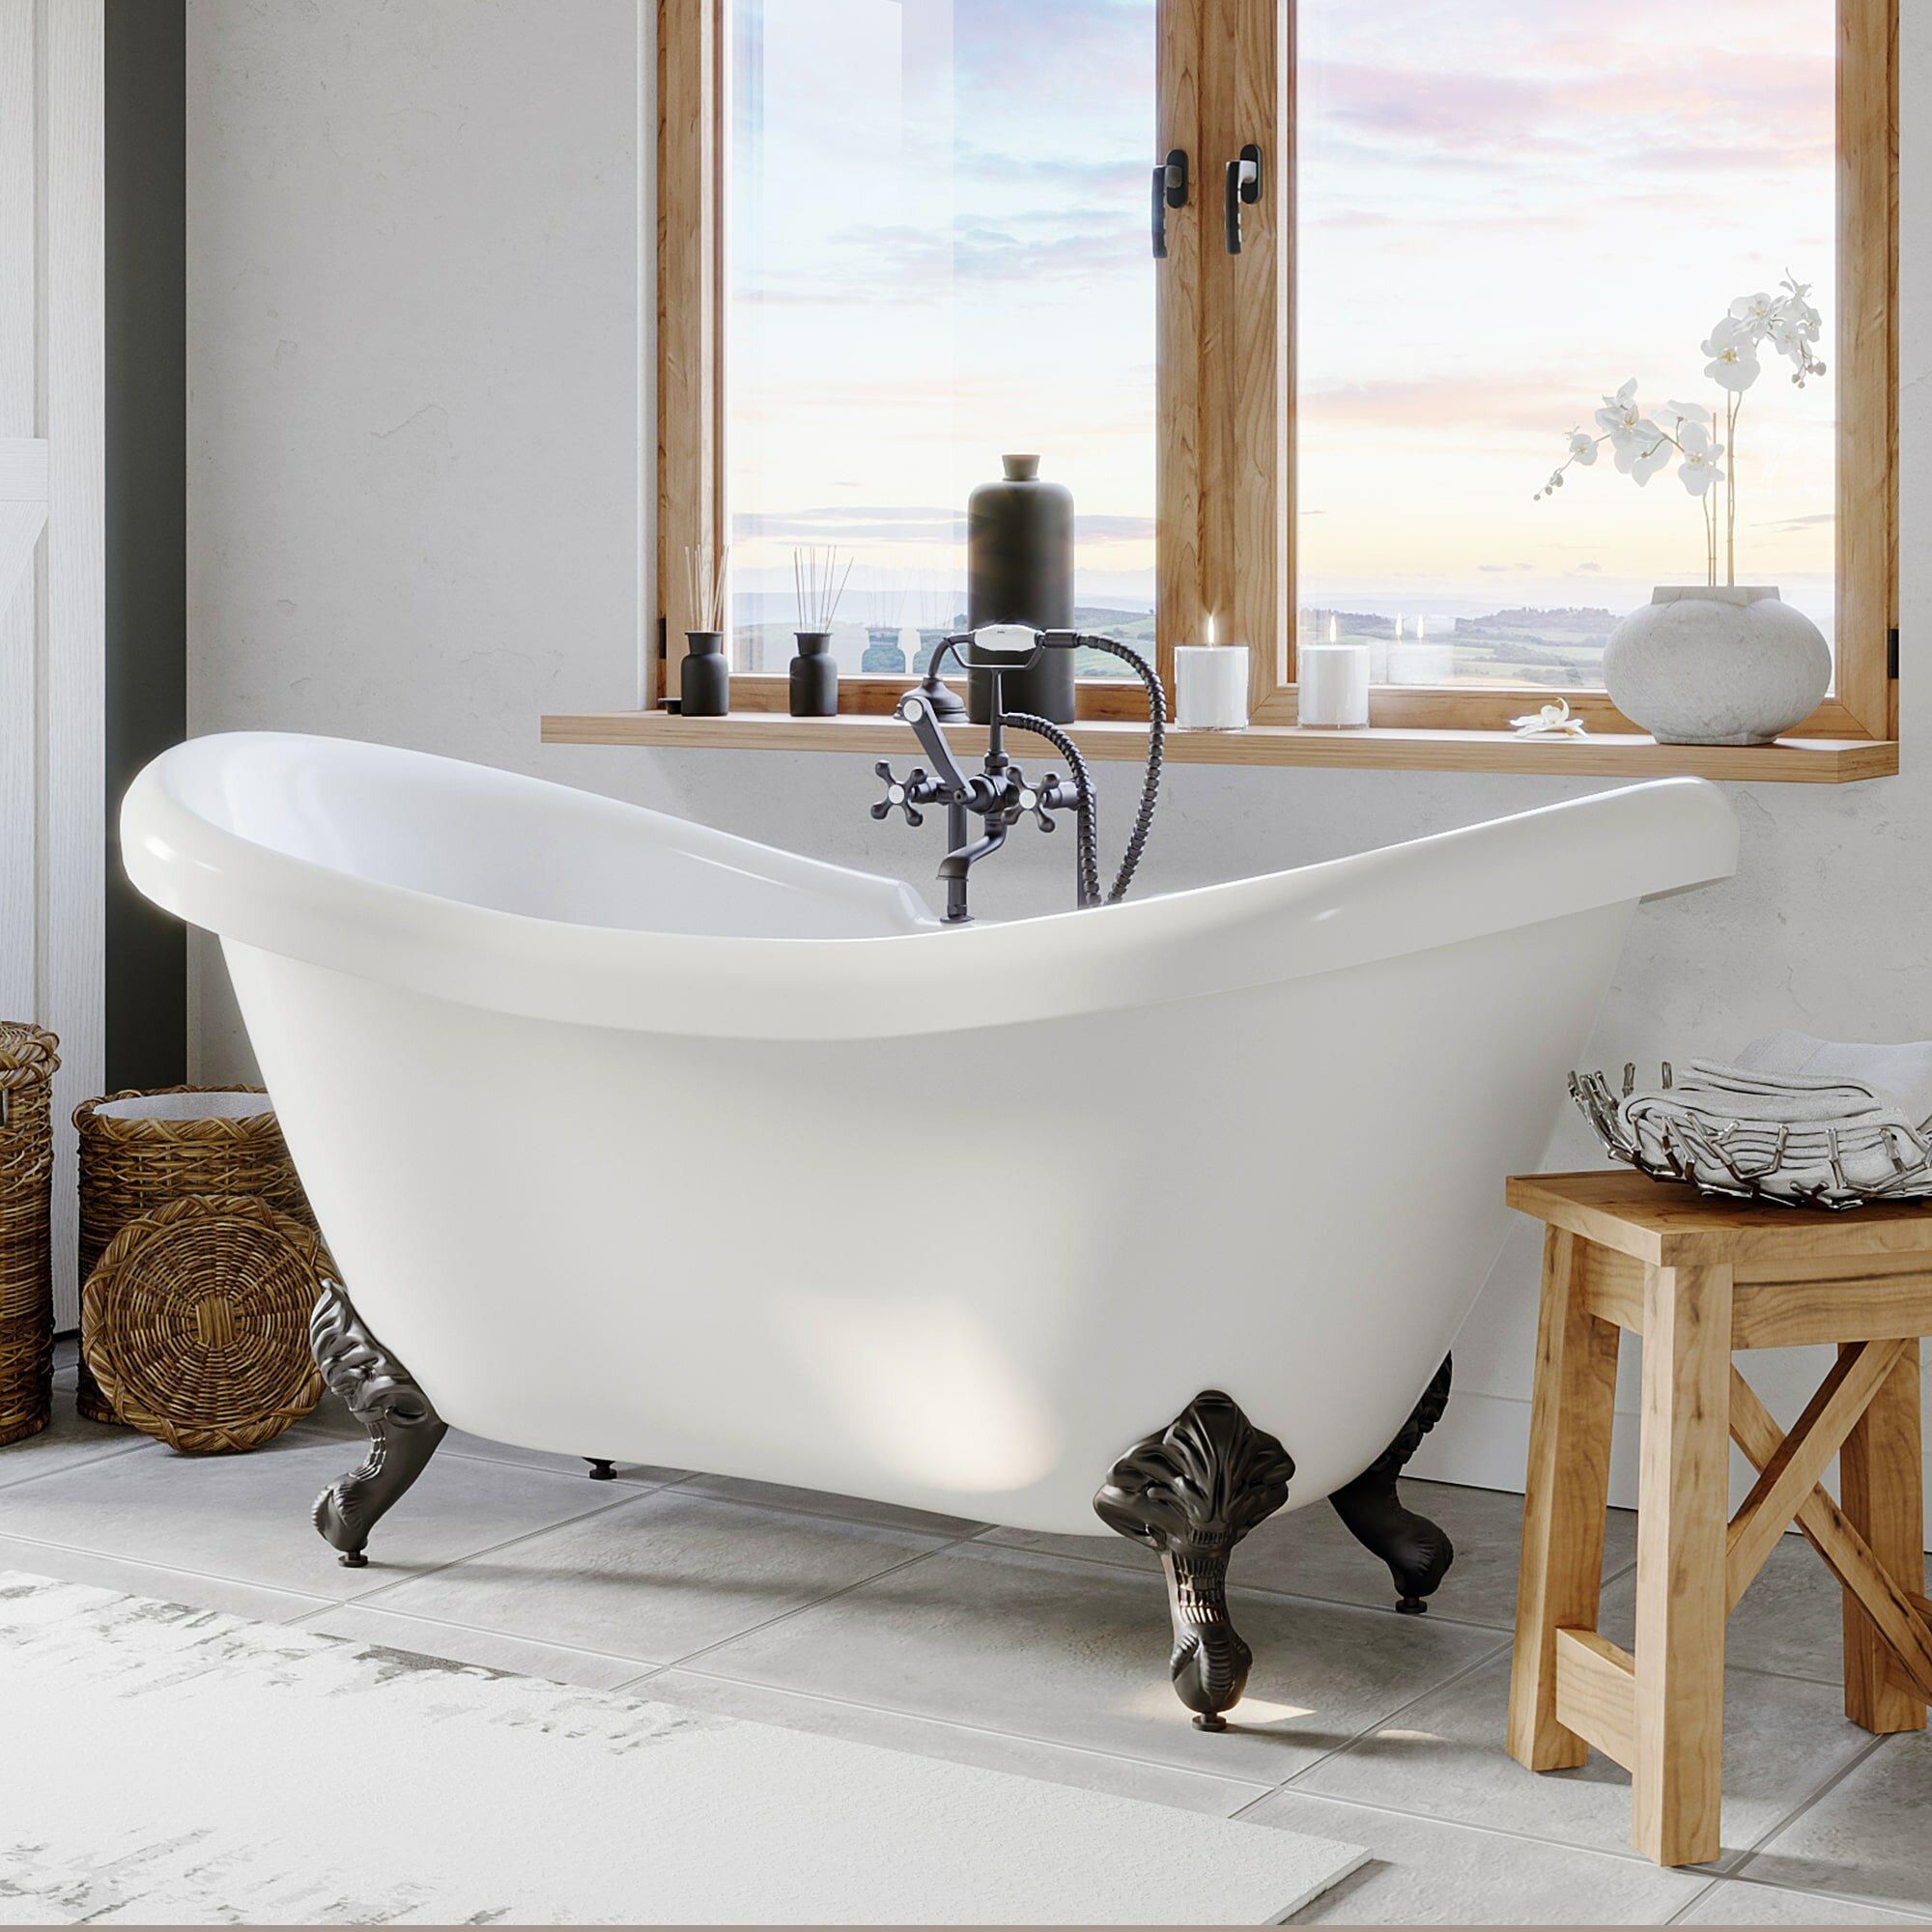 Cambridge Plumbing None 69 X 29 Clawfoot Bathtub Reviews Wayfair